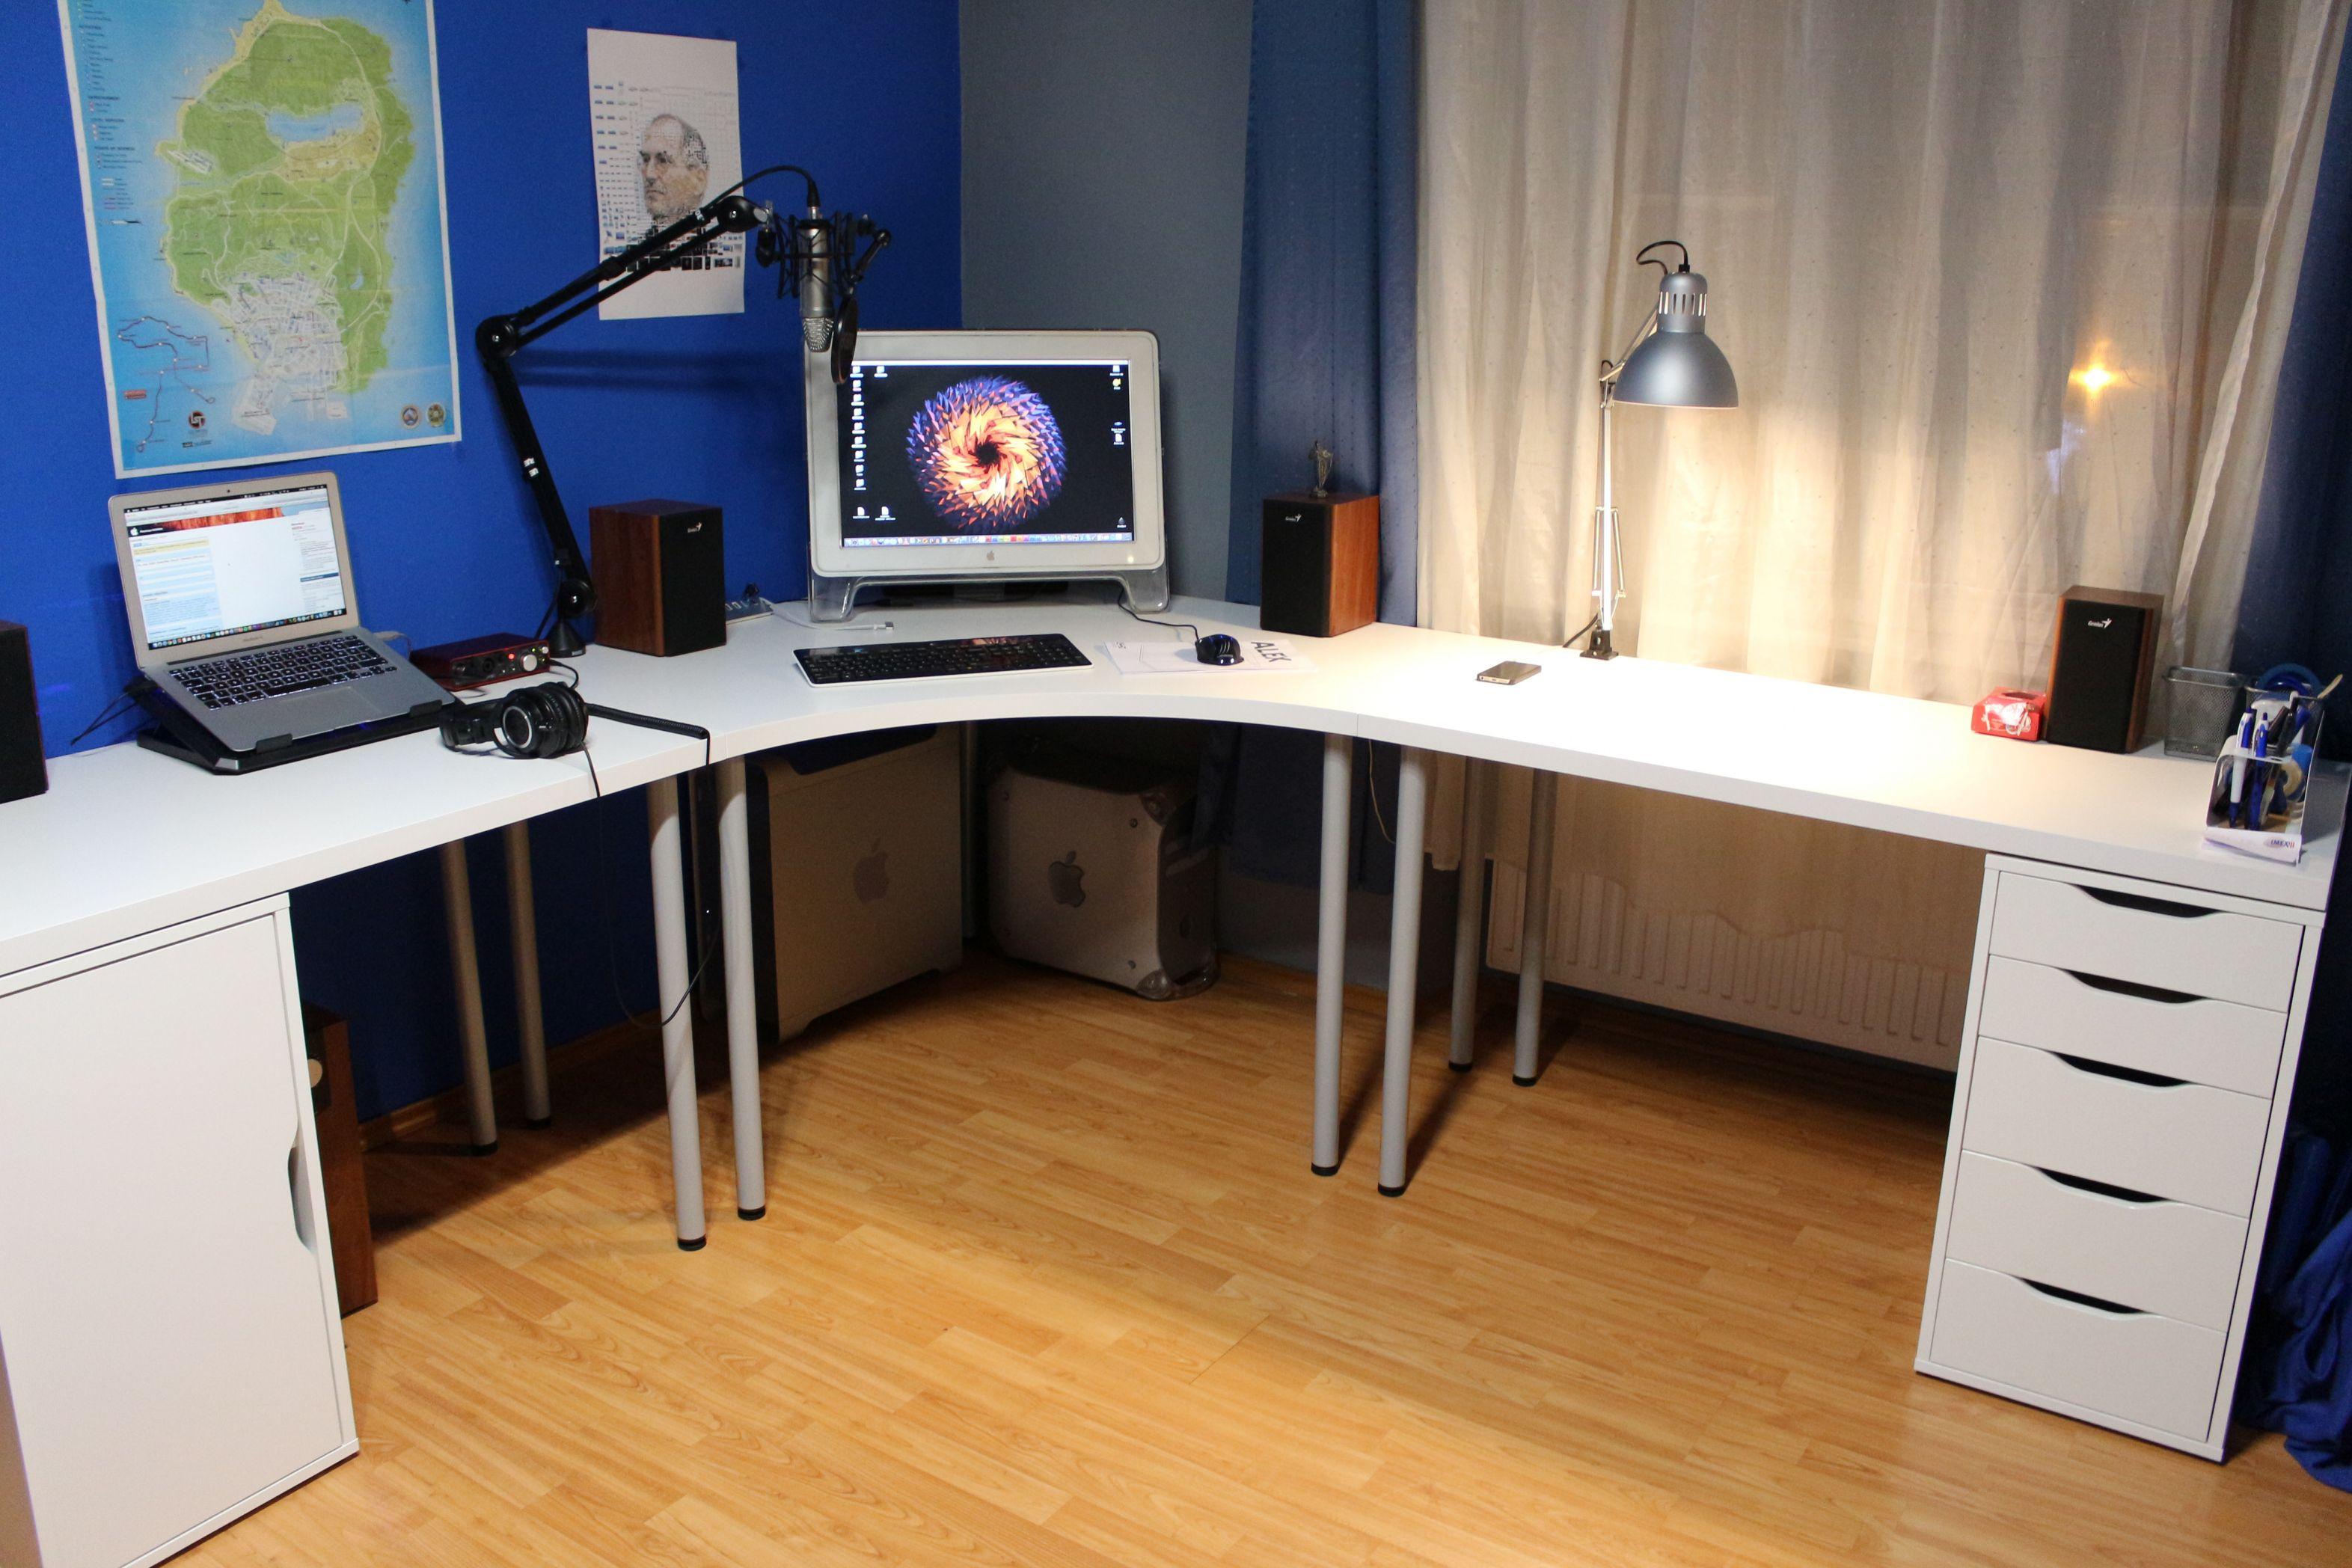 99 Ikea Linnmon Corner Desk Expensive Home Office Furniture Check More At Http Www Sewcraftyjenn Com Ikea Linnm Small Home Offices Home Office Design Home